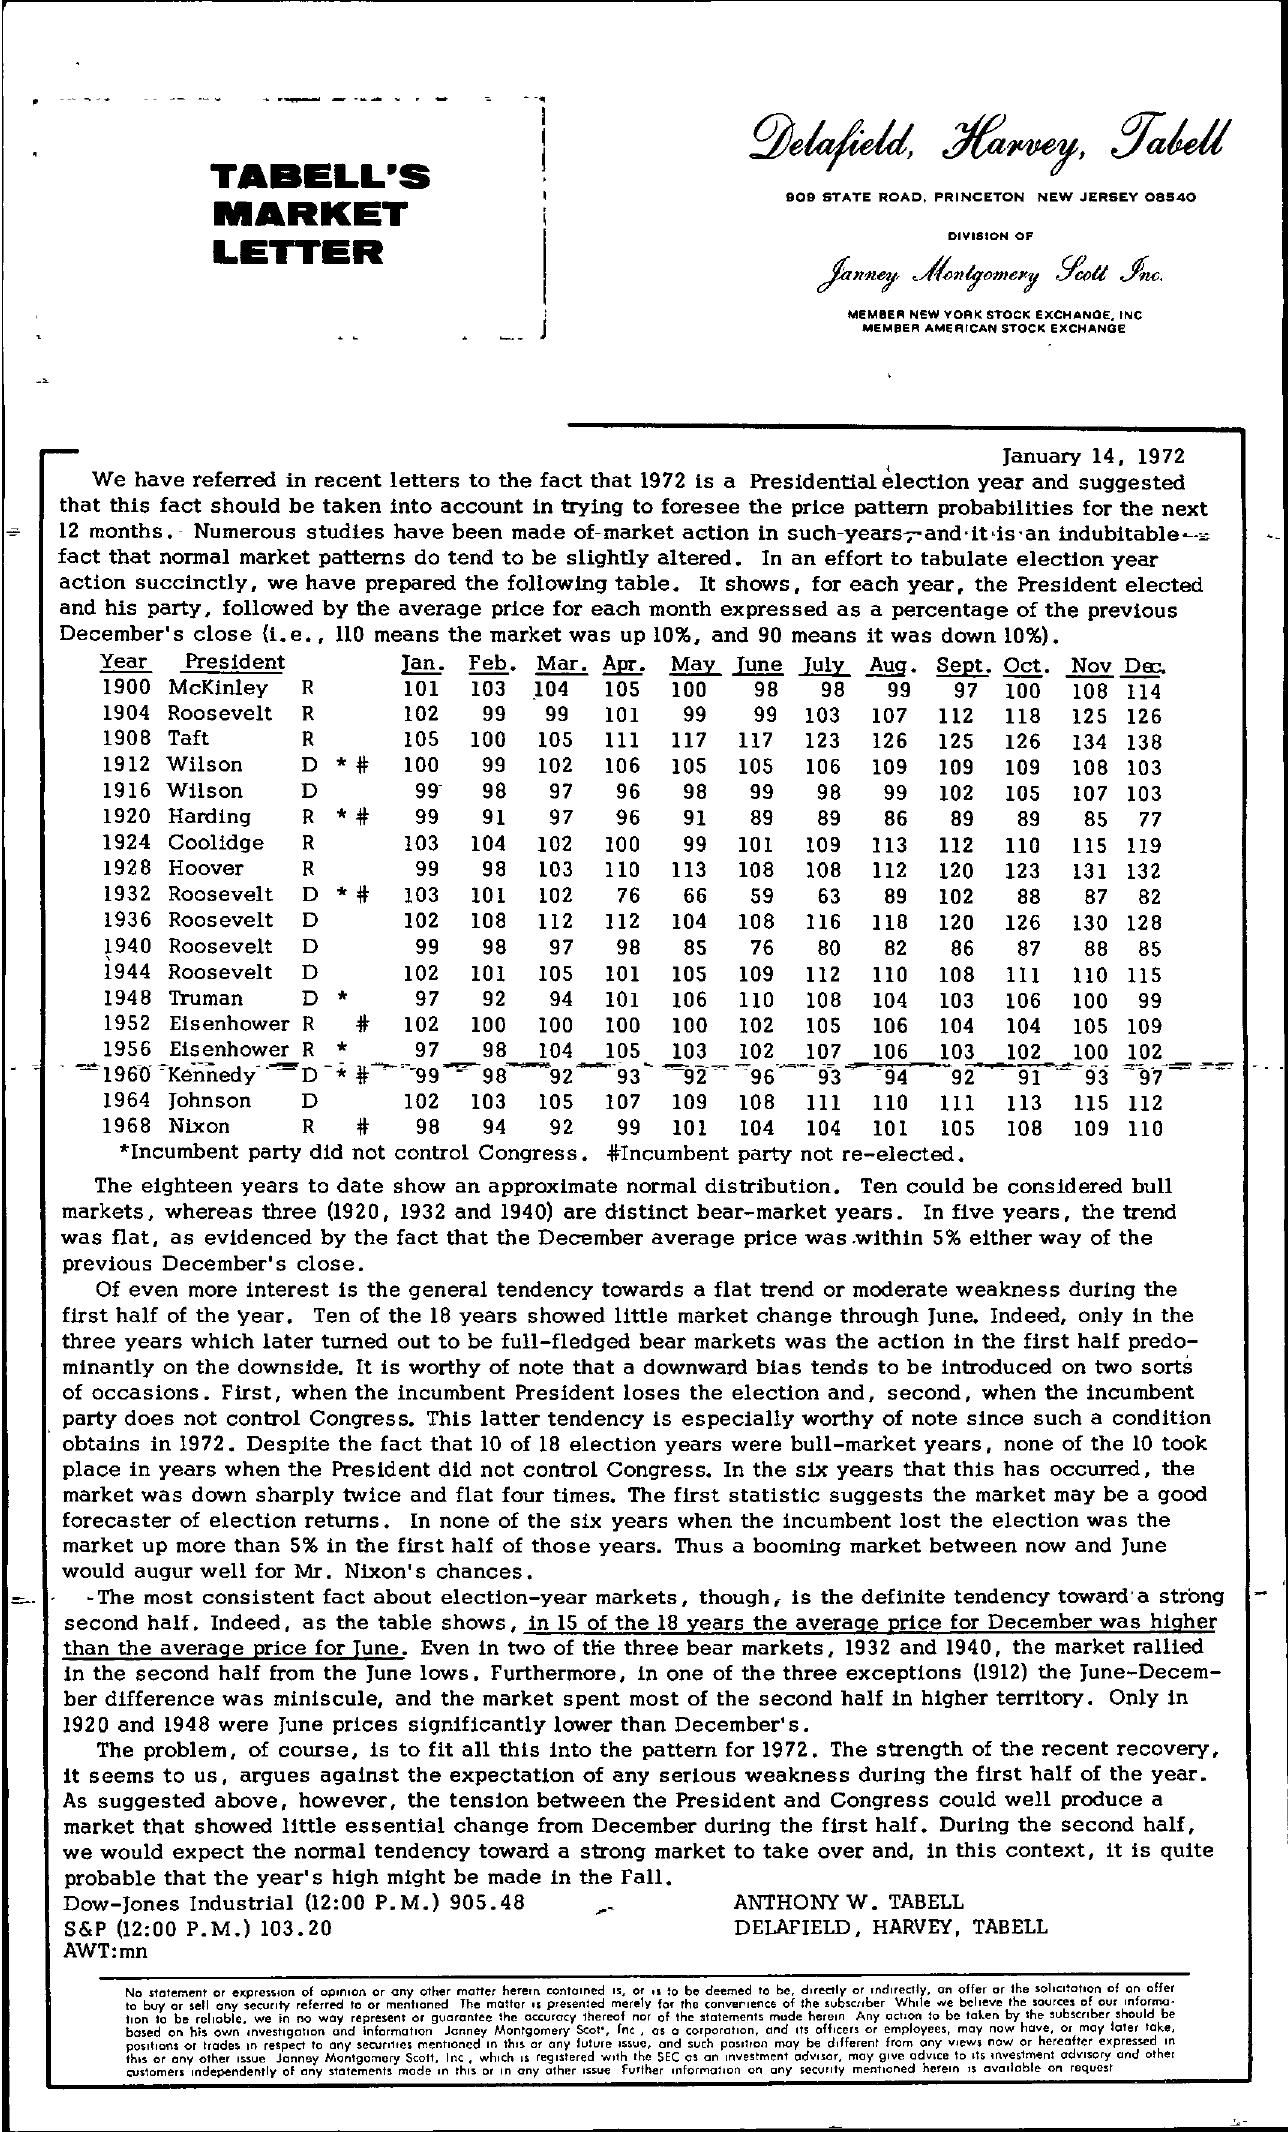 Tabell's Market Letter - January 14, 1972